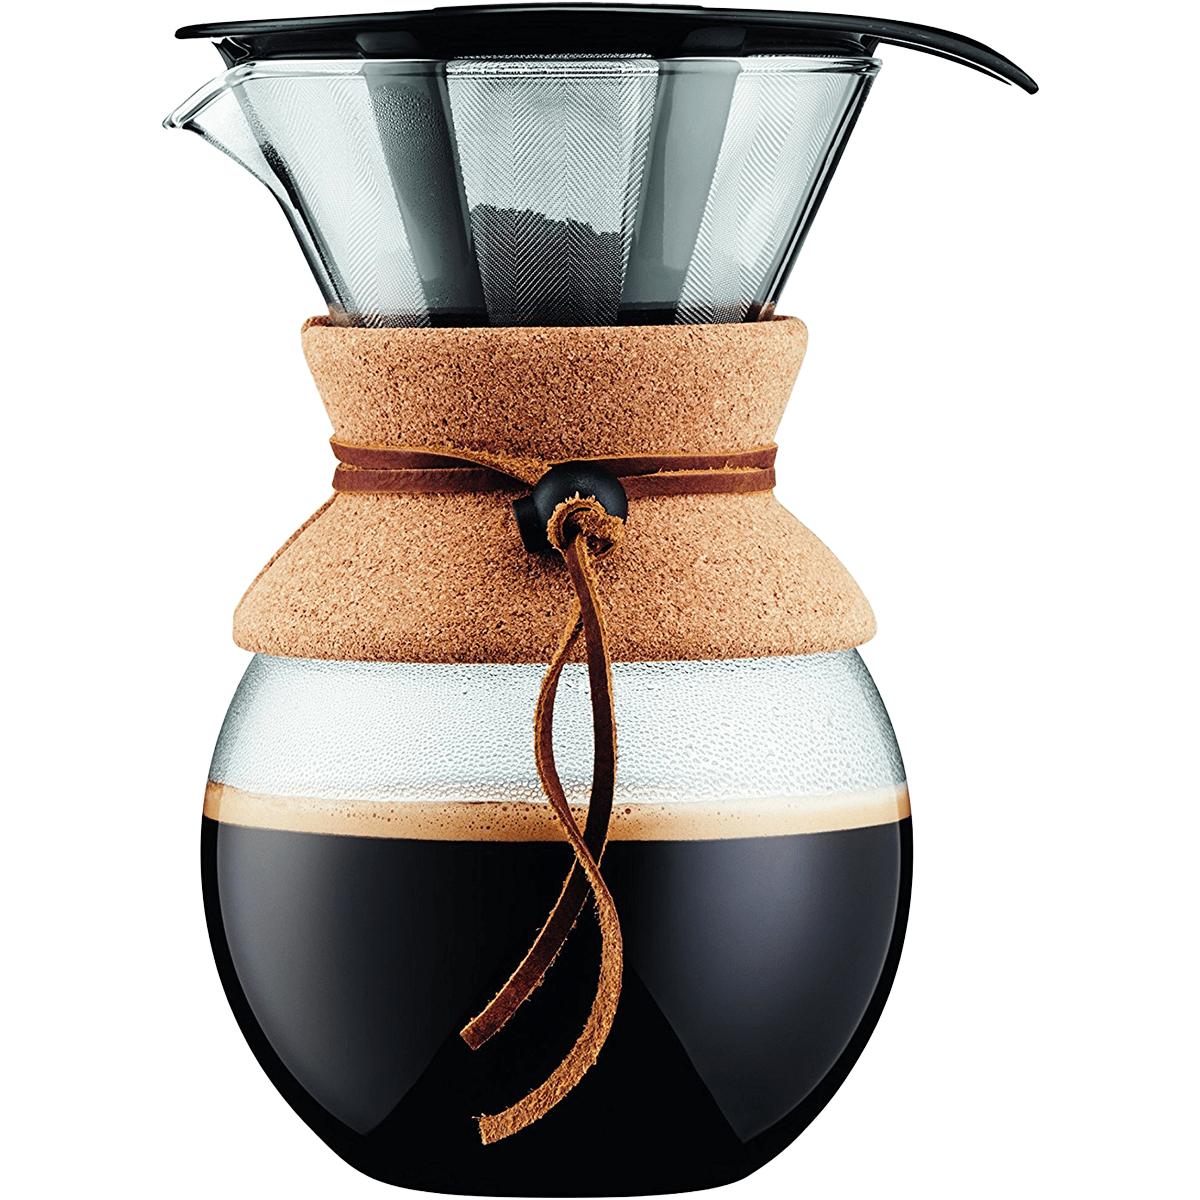 Bodum Cork Series Pour Over Coffee Maker - 34 Oz.